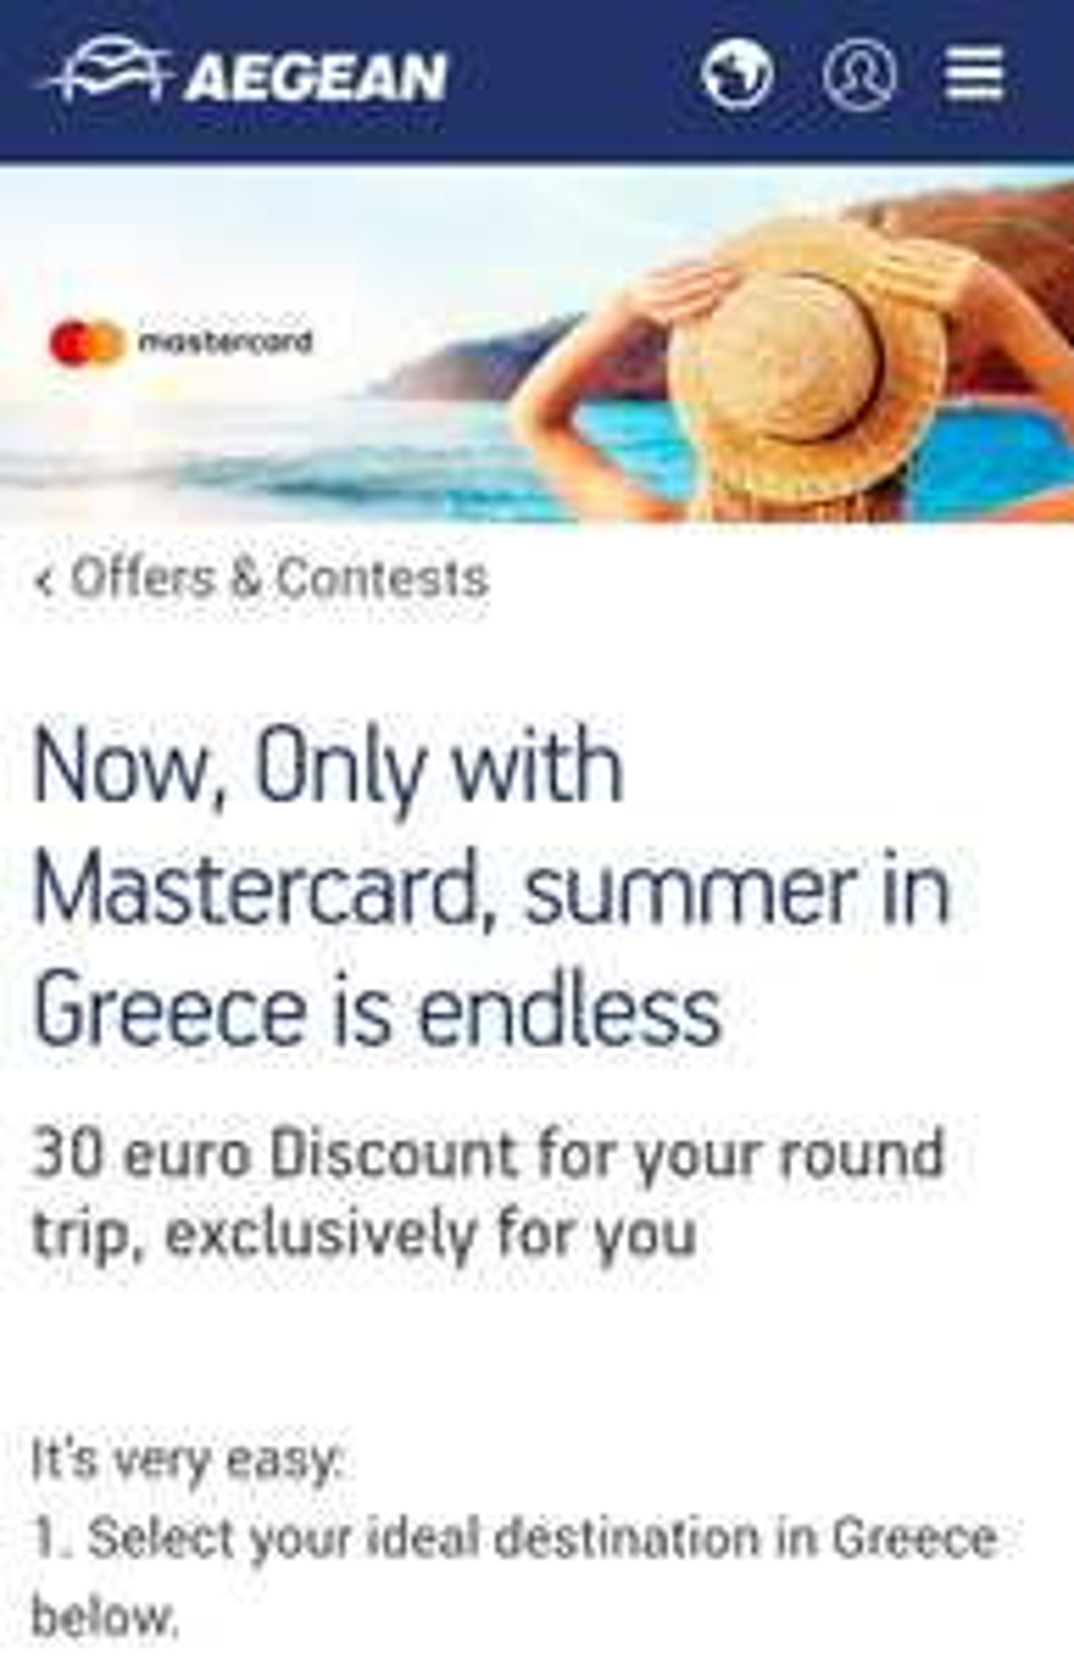 Zniżka 30% lub EUR30 Na loty do Grecji @AEGEAN Airlines